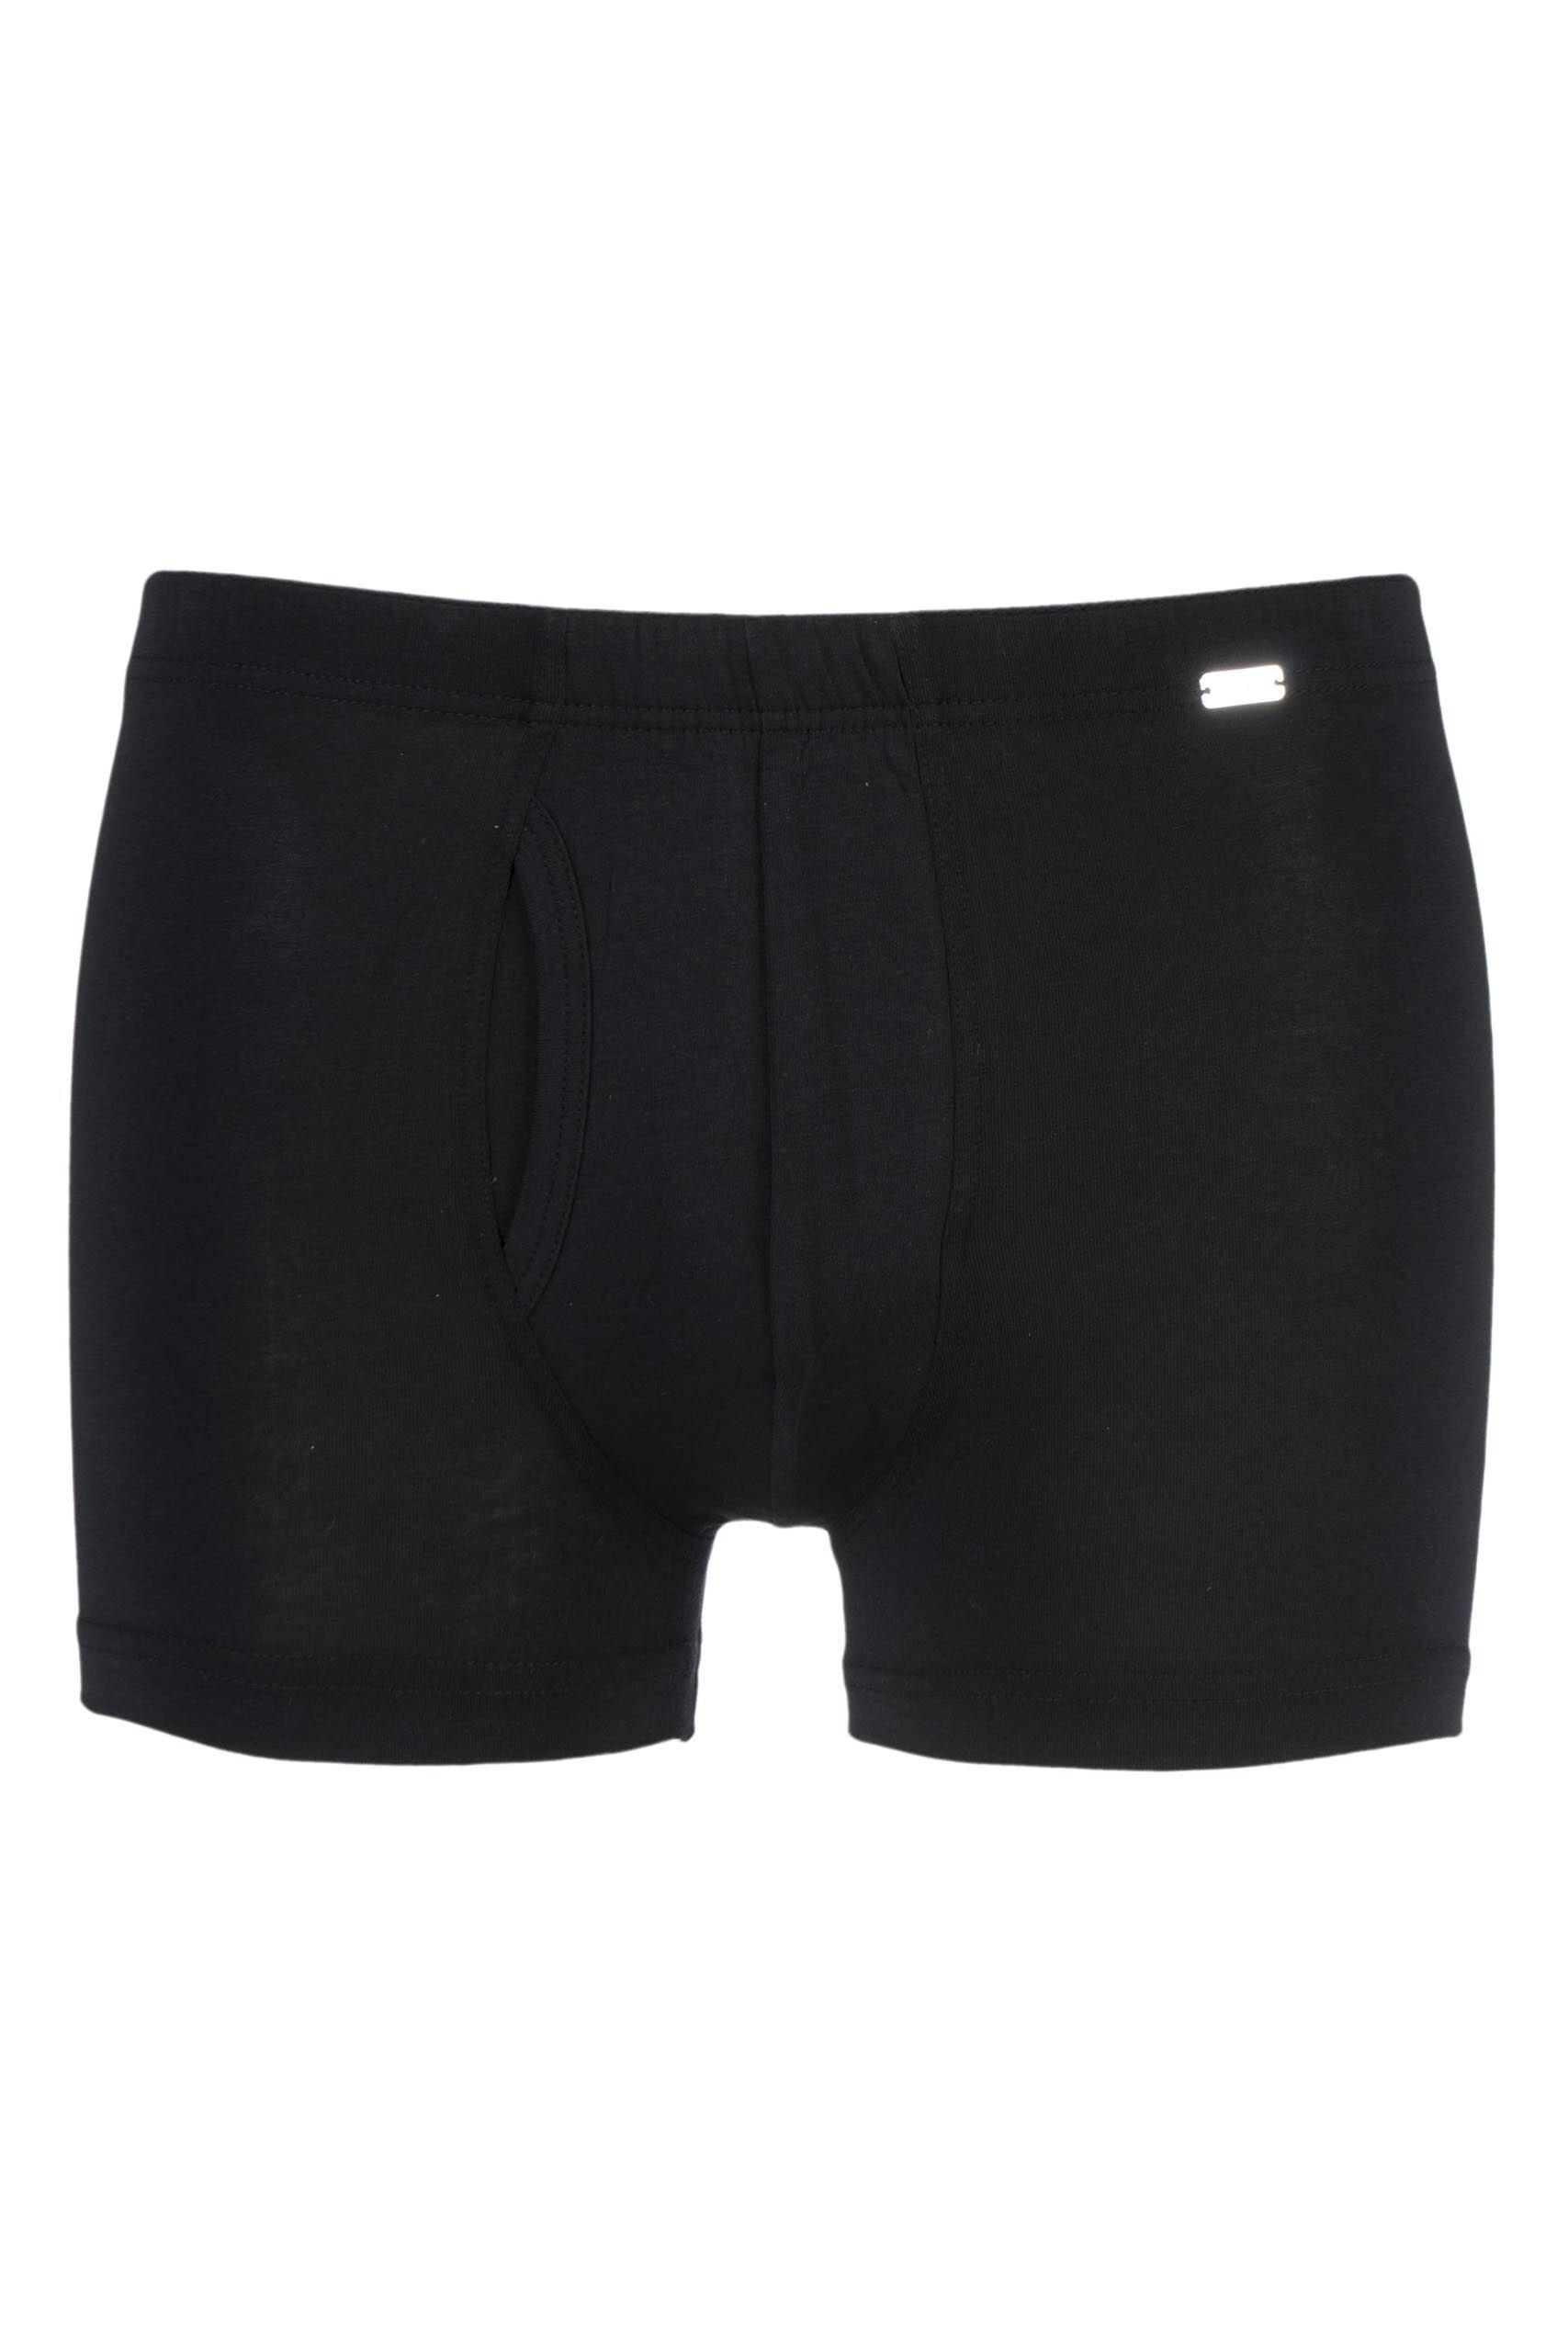 Image of 1 Pack Black Modern Stretch Comfort Trunks Men's Medium - Jockey